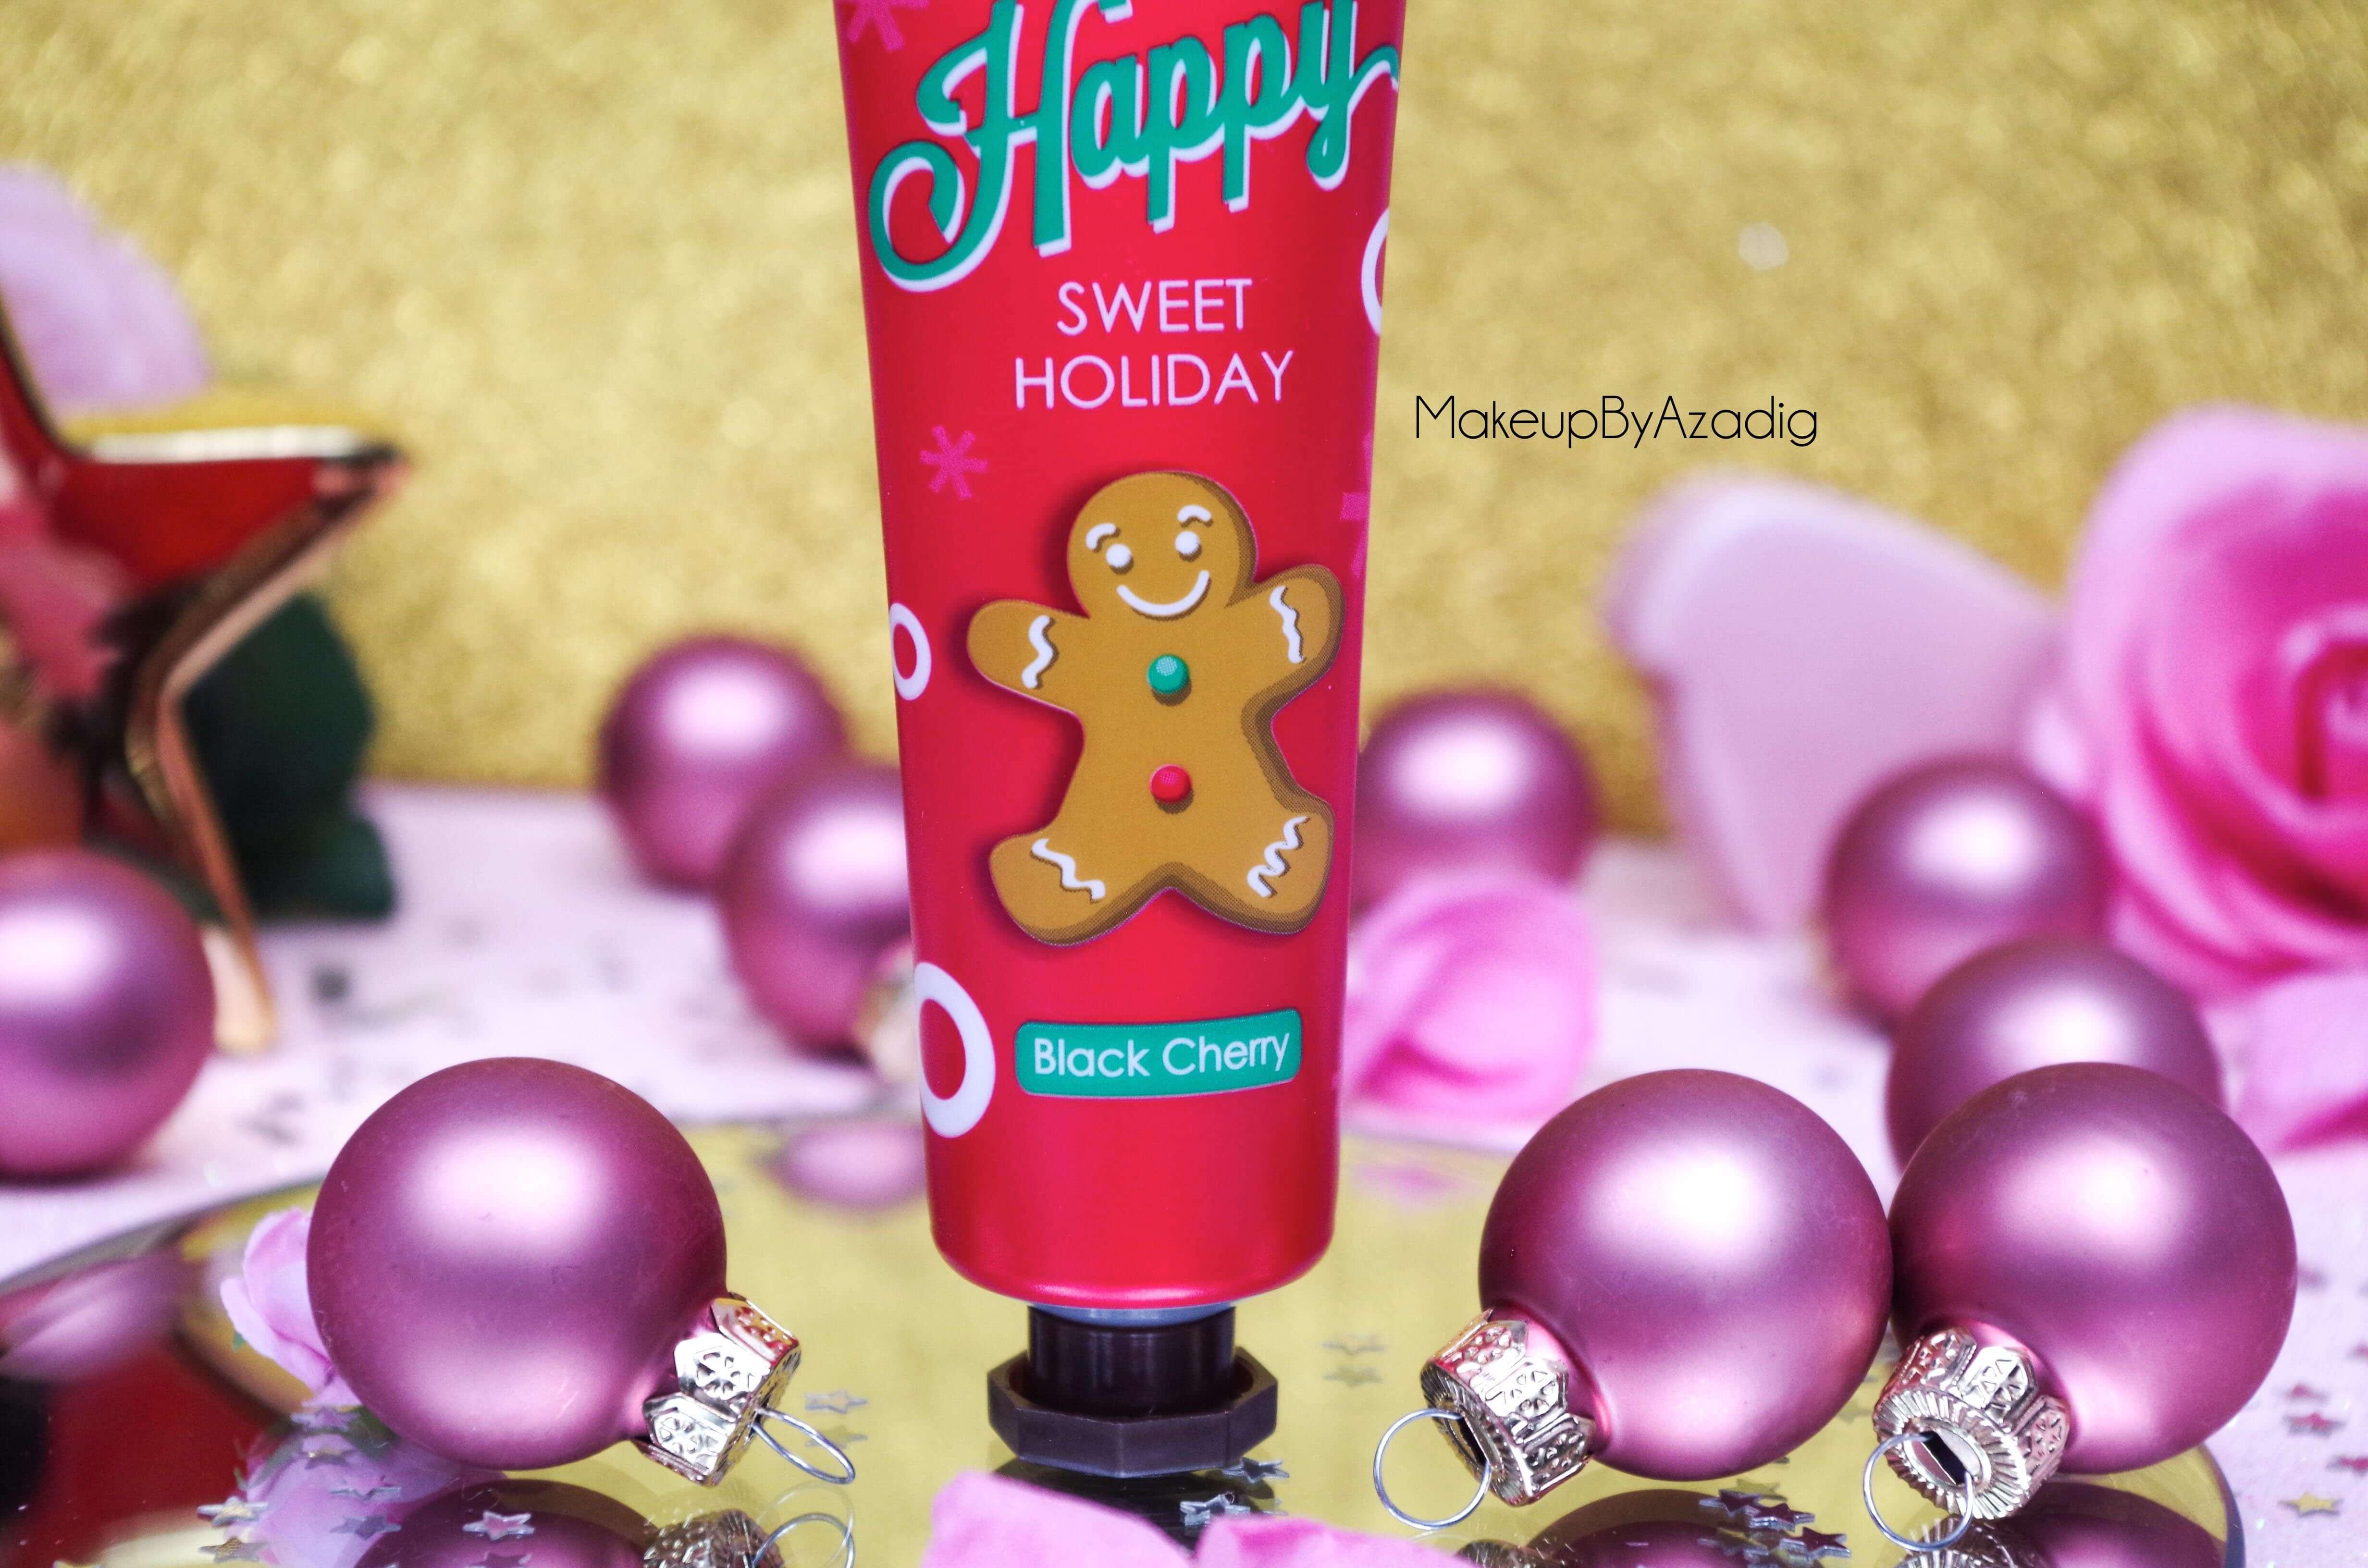 makeupbyazadig-tonymoly-sephora-paris-troyes-creme-mains-collection-noel-holiday-avis-revue-cherry